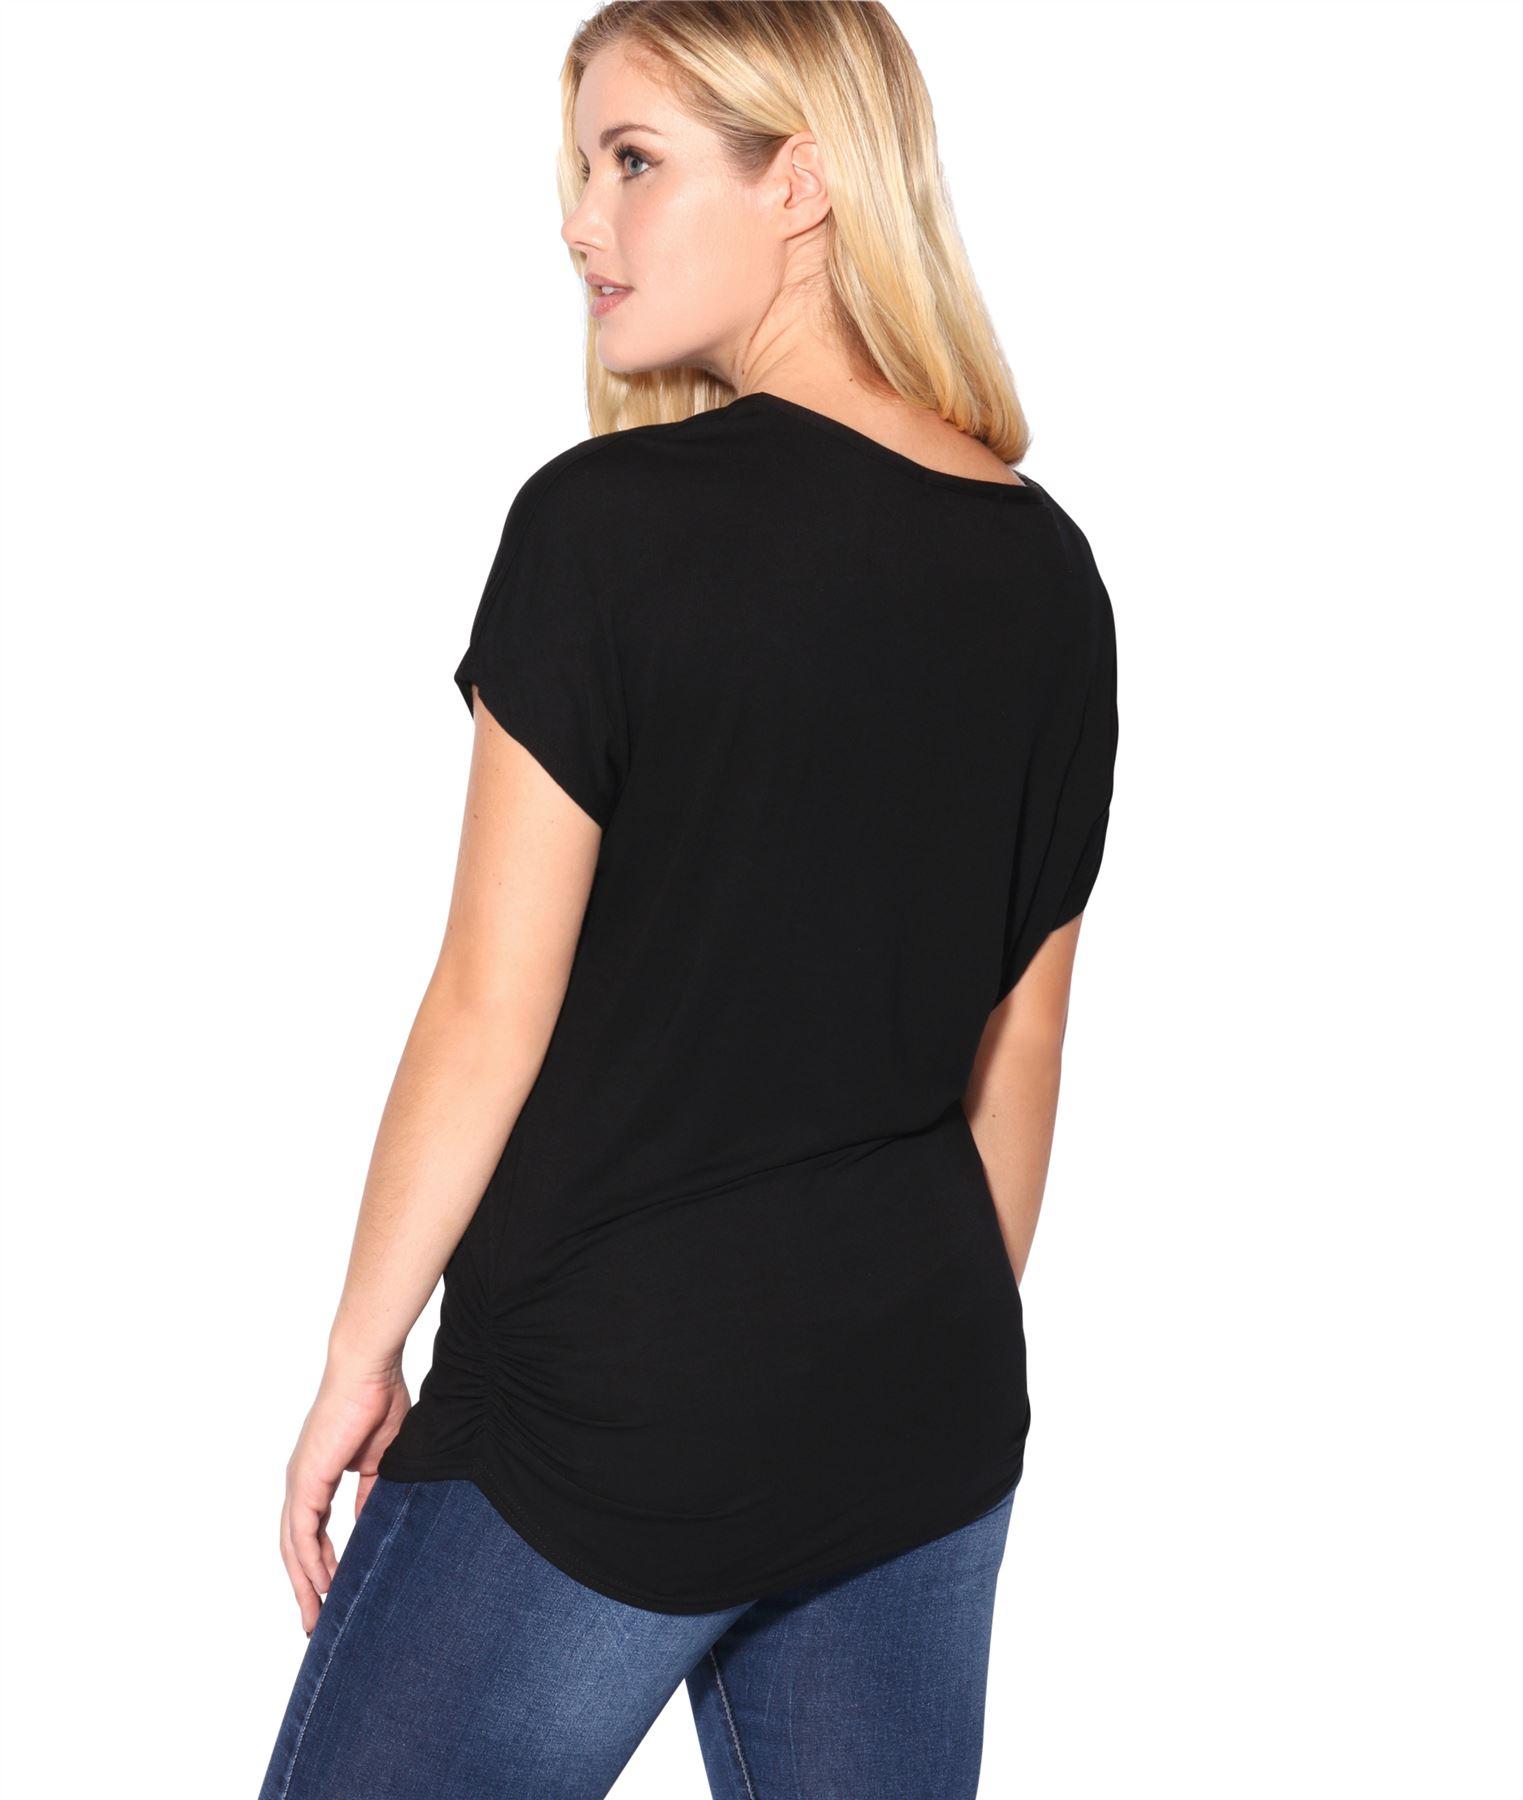 Womens-Oversized-Batwing-T-Shirt-Ladies-Baggy-Animal-Tiger-Blouse-Print-Top thumbnail 5